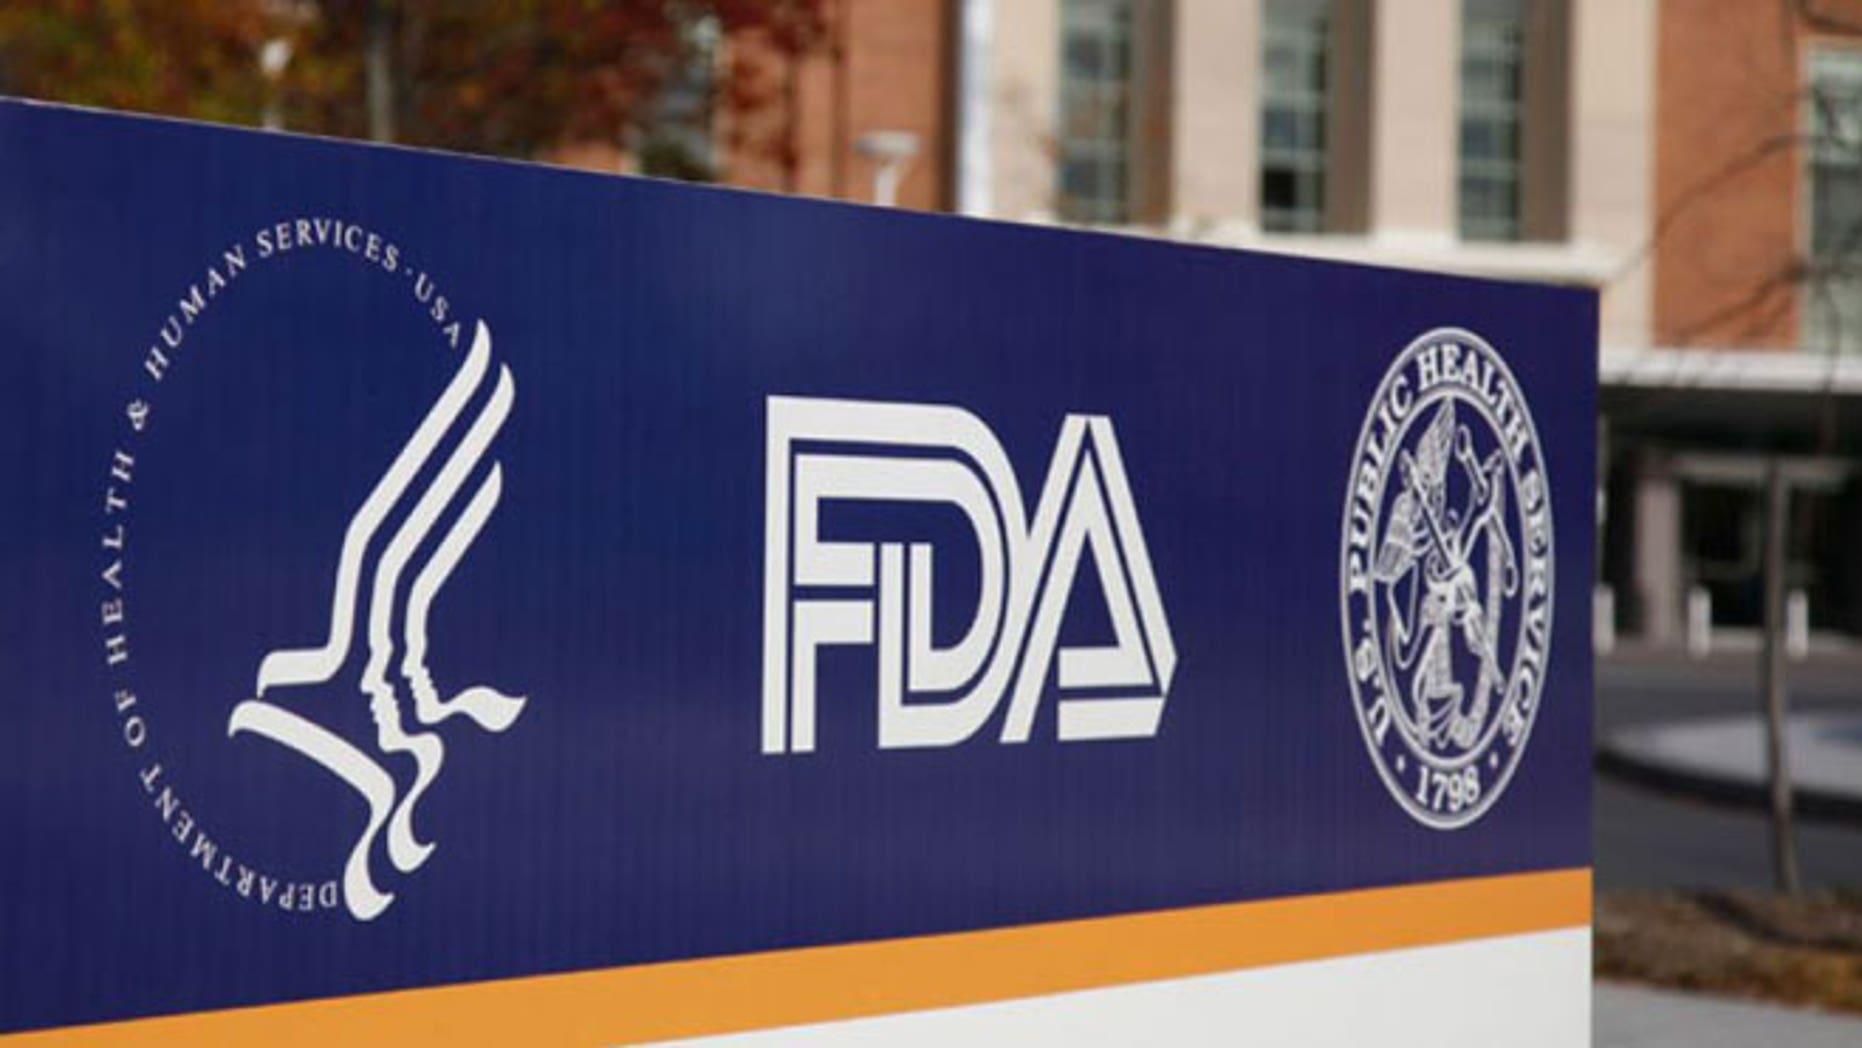 Fda Approves Eli Lilly S Basaglar Diabetes Drug Fox News